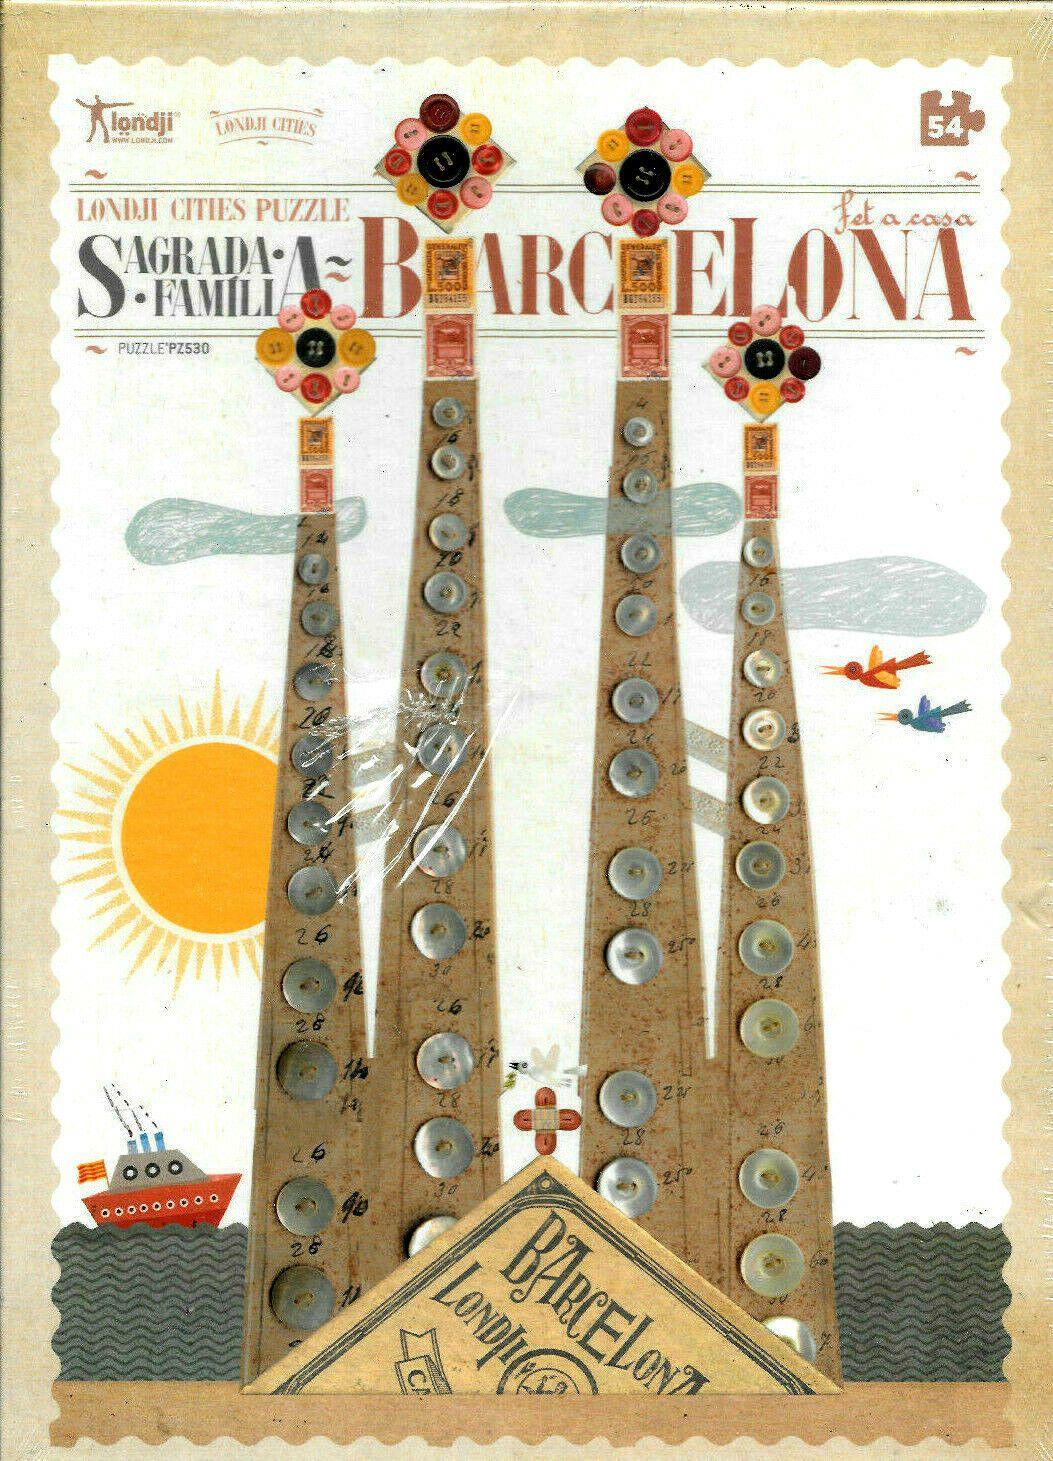 Barcelona Spain Sagrada Familia 54 Piece Jigsaw Puzzle